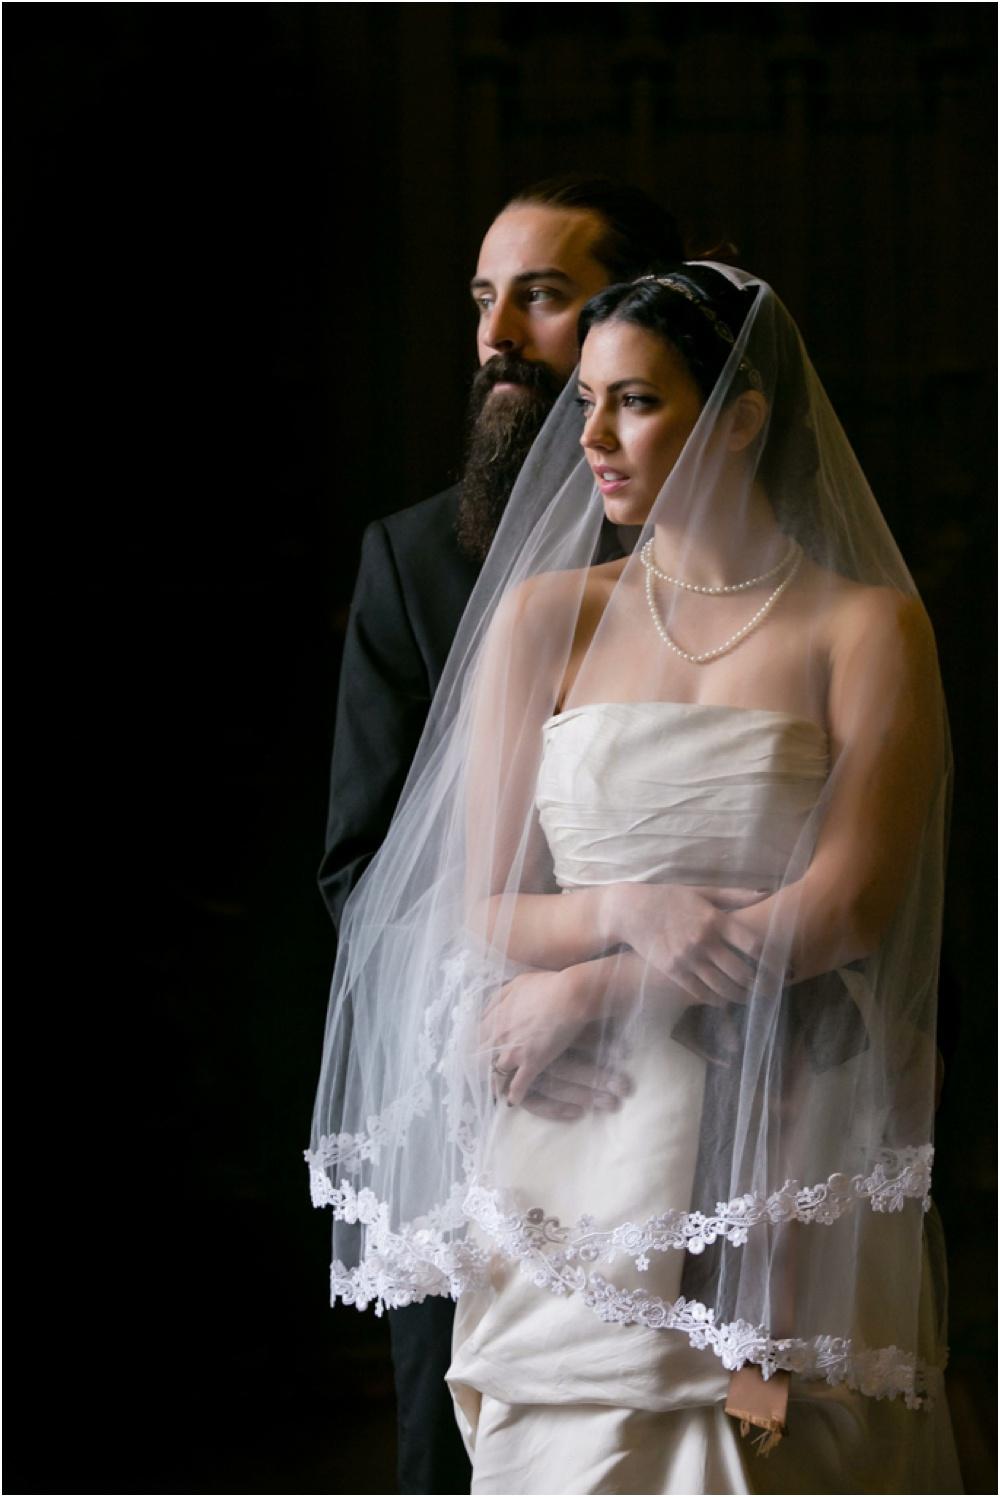 RI-Wedding-Photographer-Lefebvre-Photo-Blog_2256.jpg